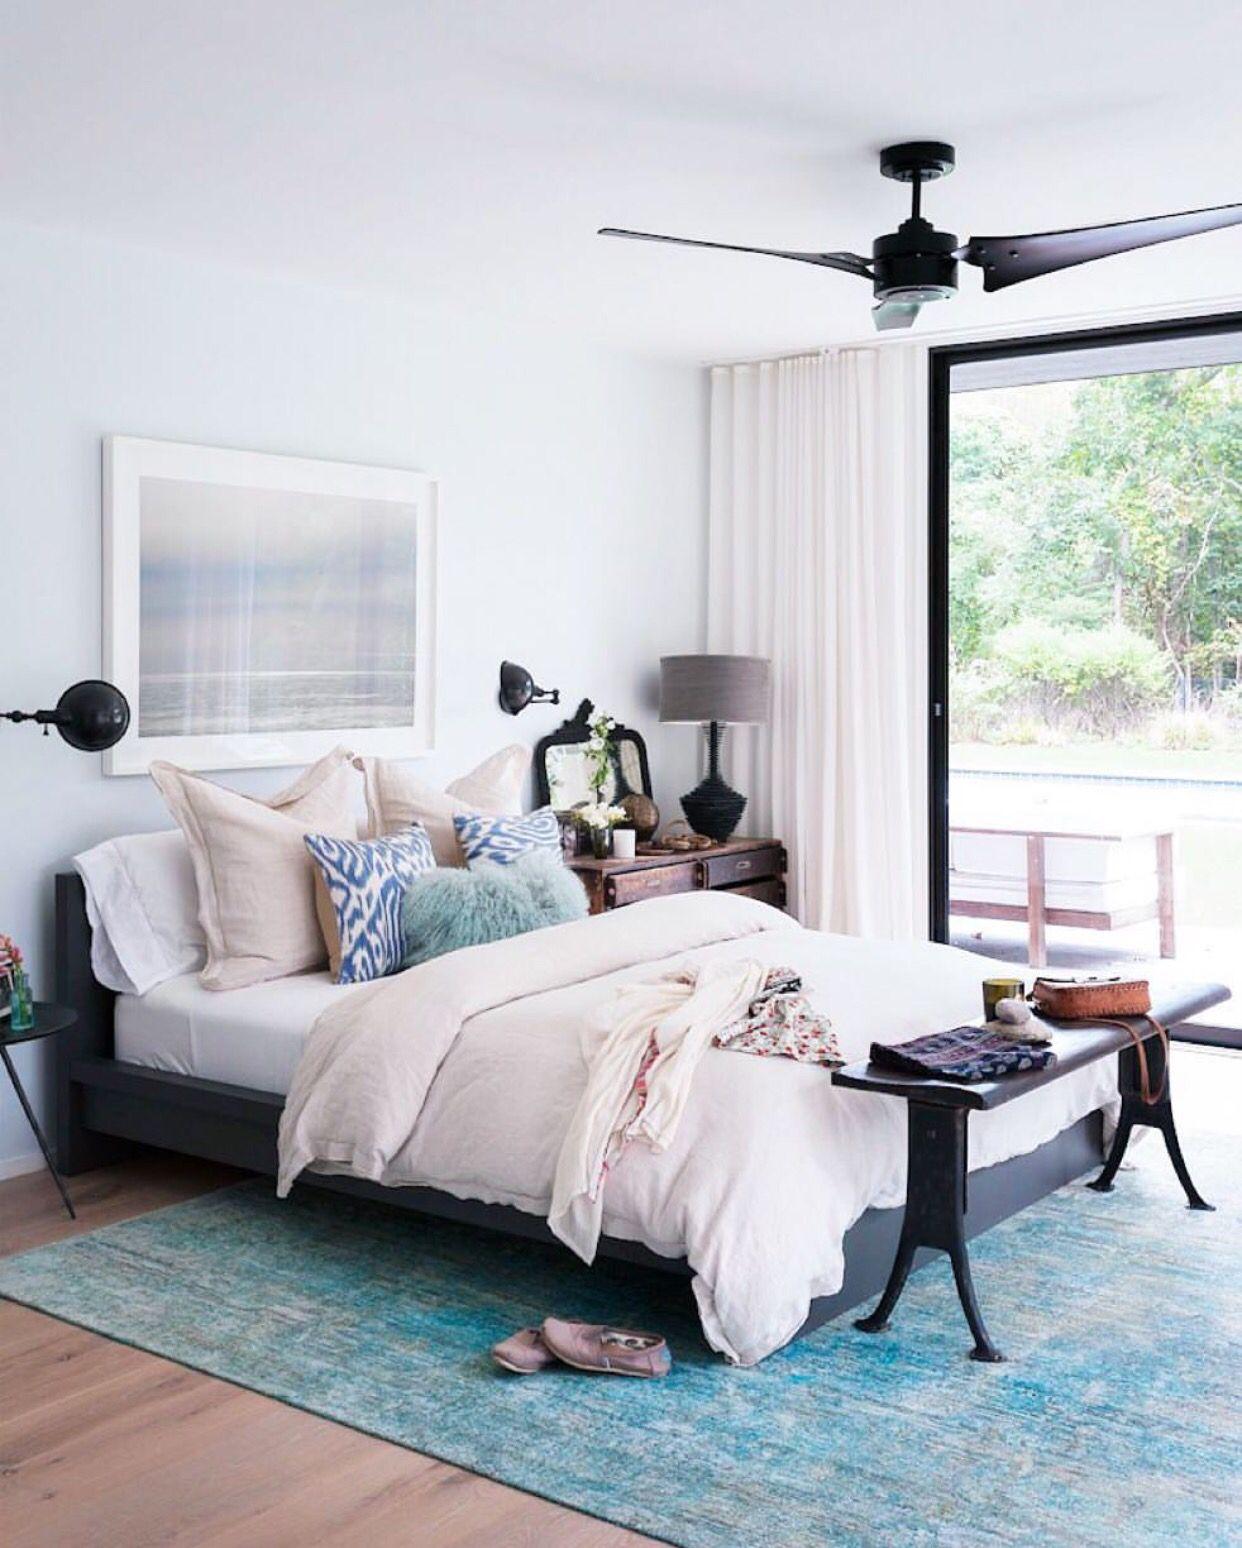 Master bedroom curtains  Bedroom curtains   BEDROOM   Pinterest  Bedrooms